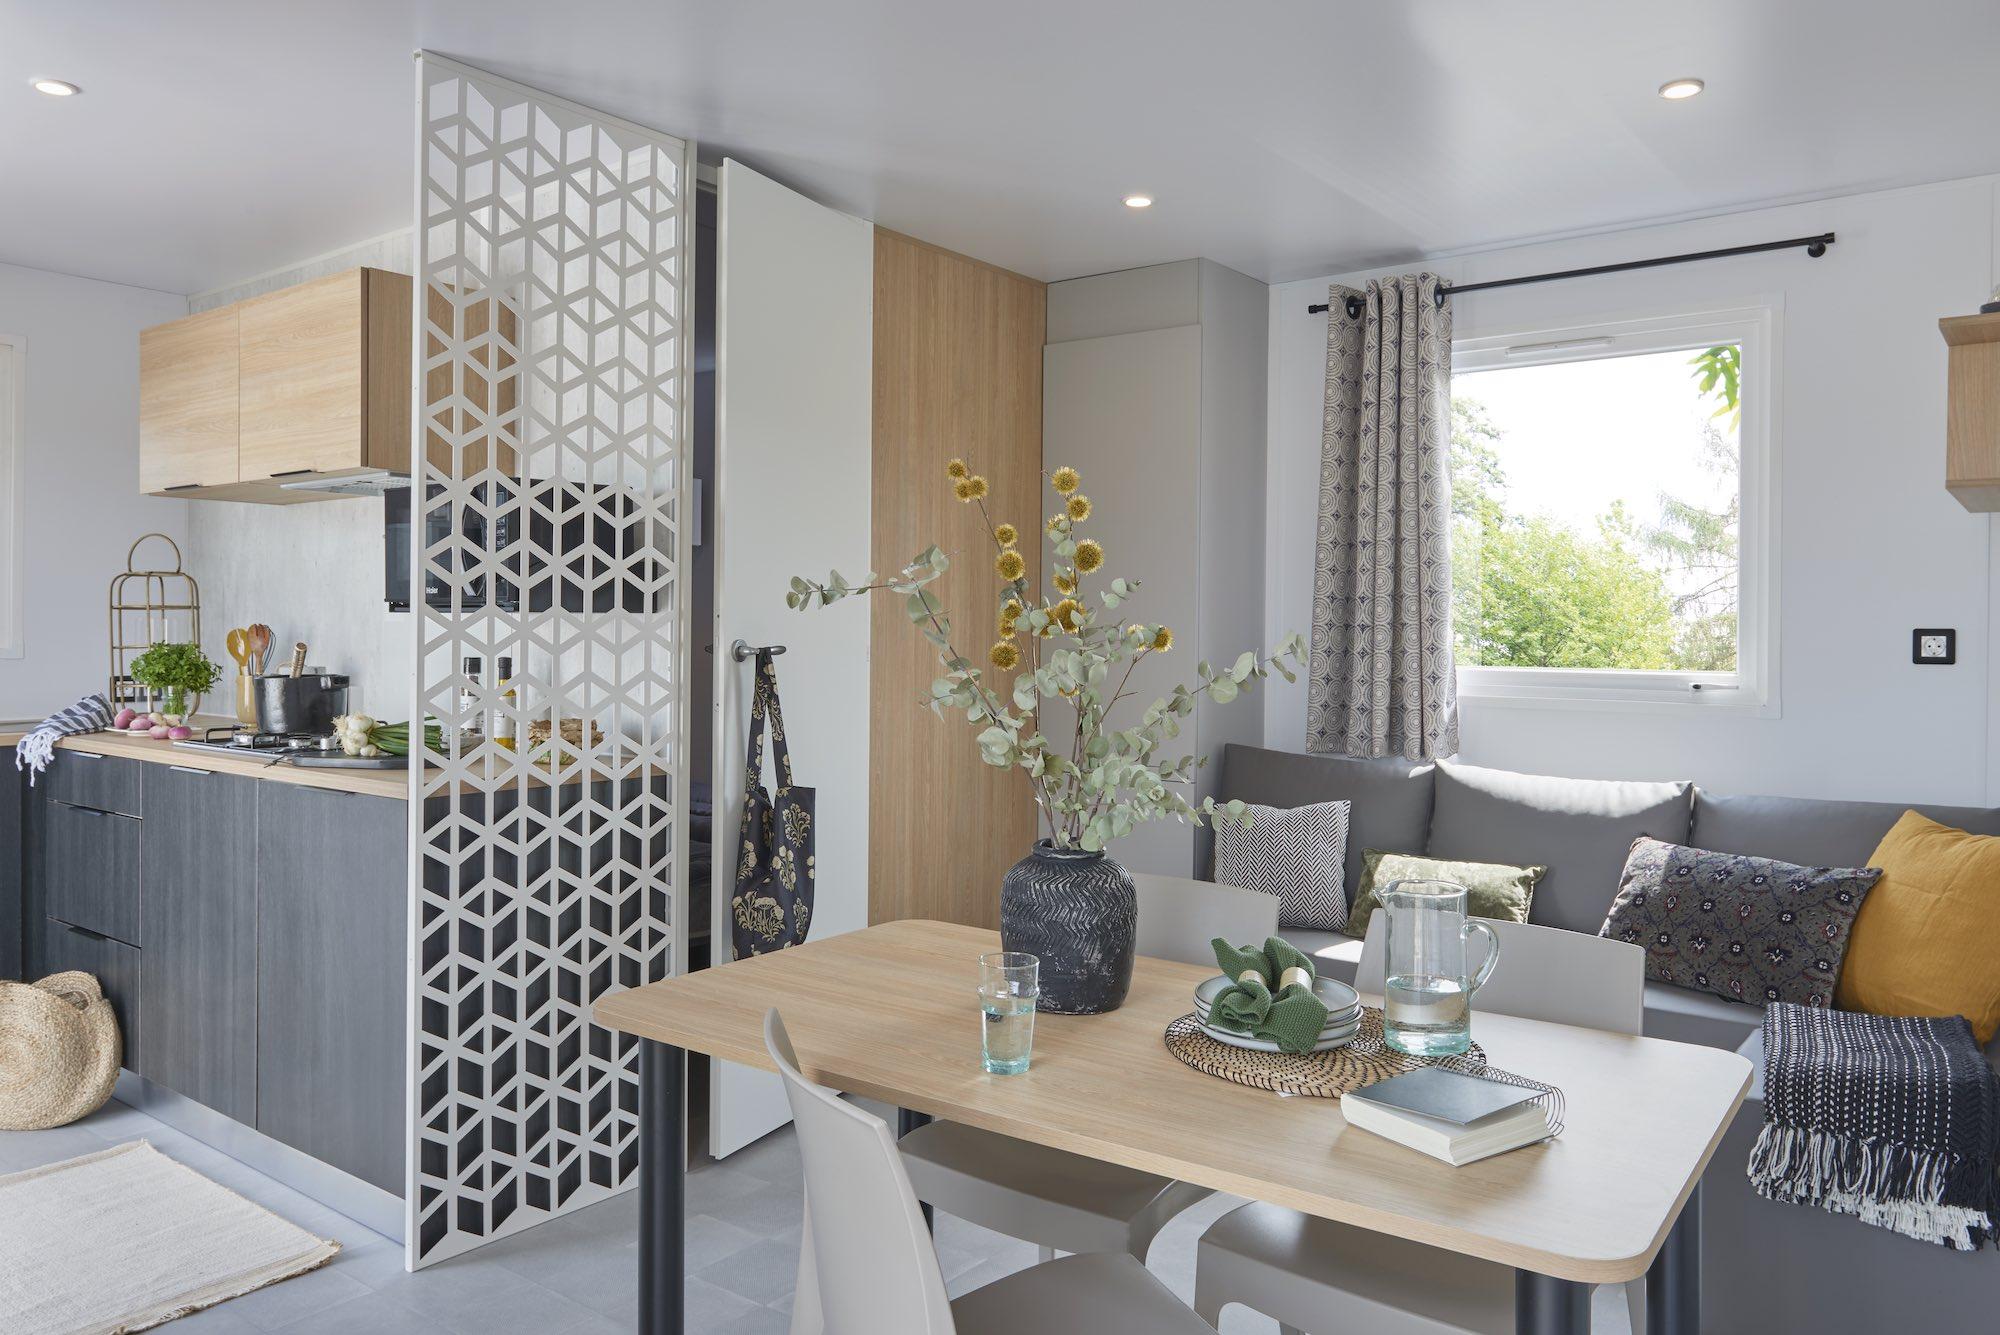 Location-mobil-home-grand-confort-2-chambres-camping-saint-jean-de-monts-Le-Tropicana